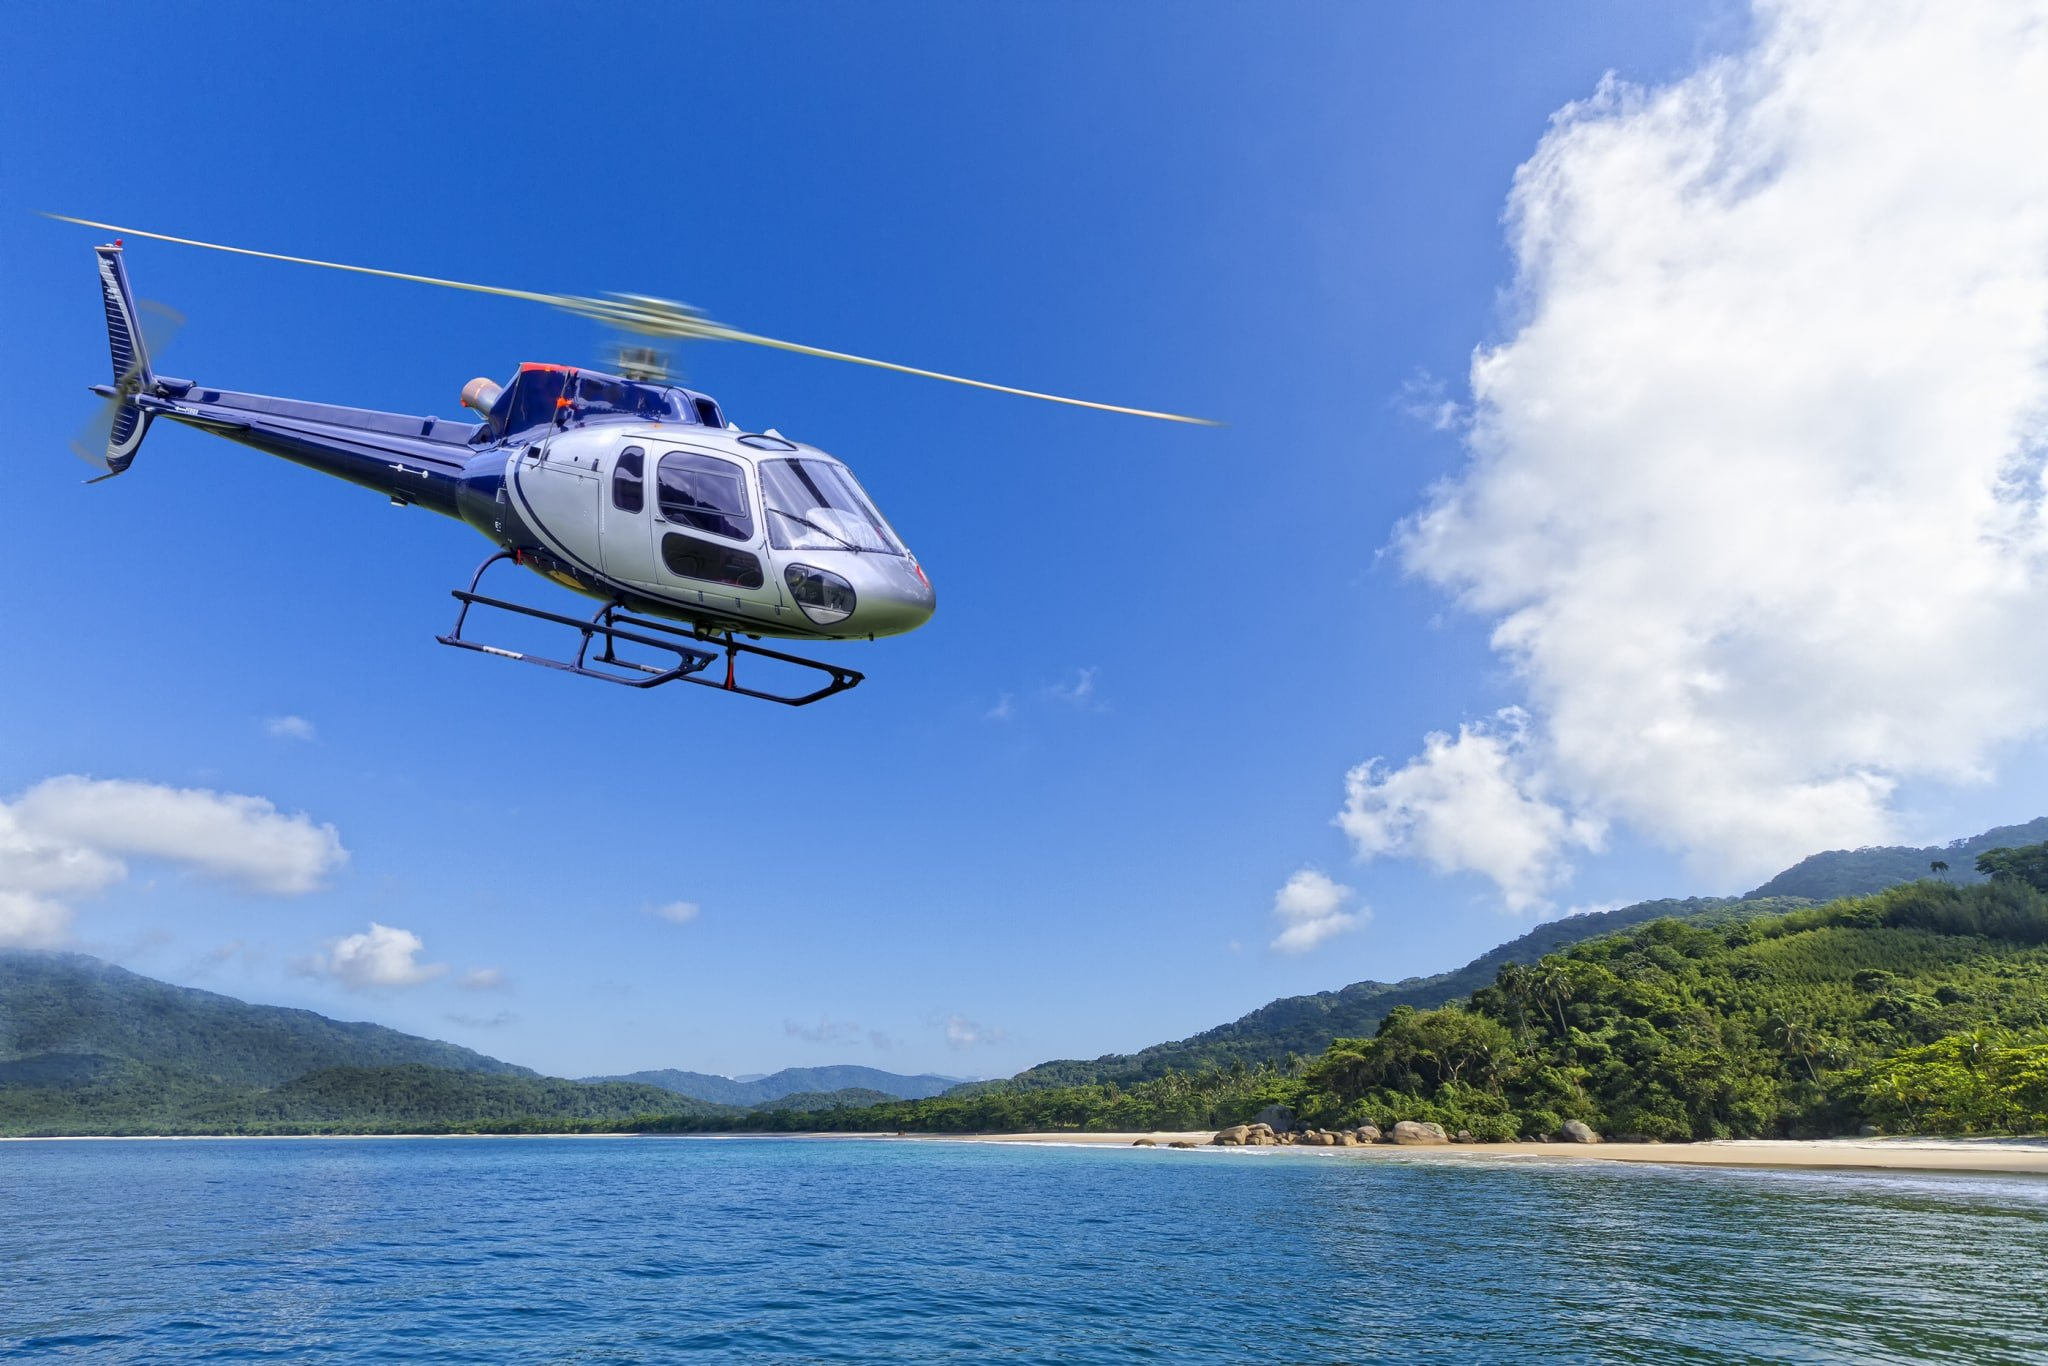 Big Island Spectacular Helicopter Tour Hana-Haleakala Helicopter Tour